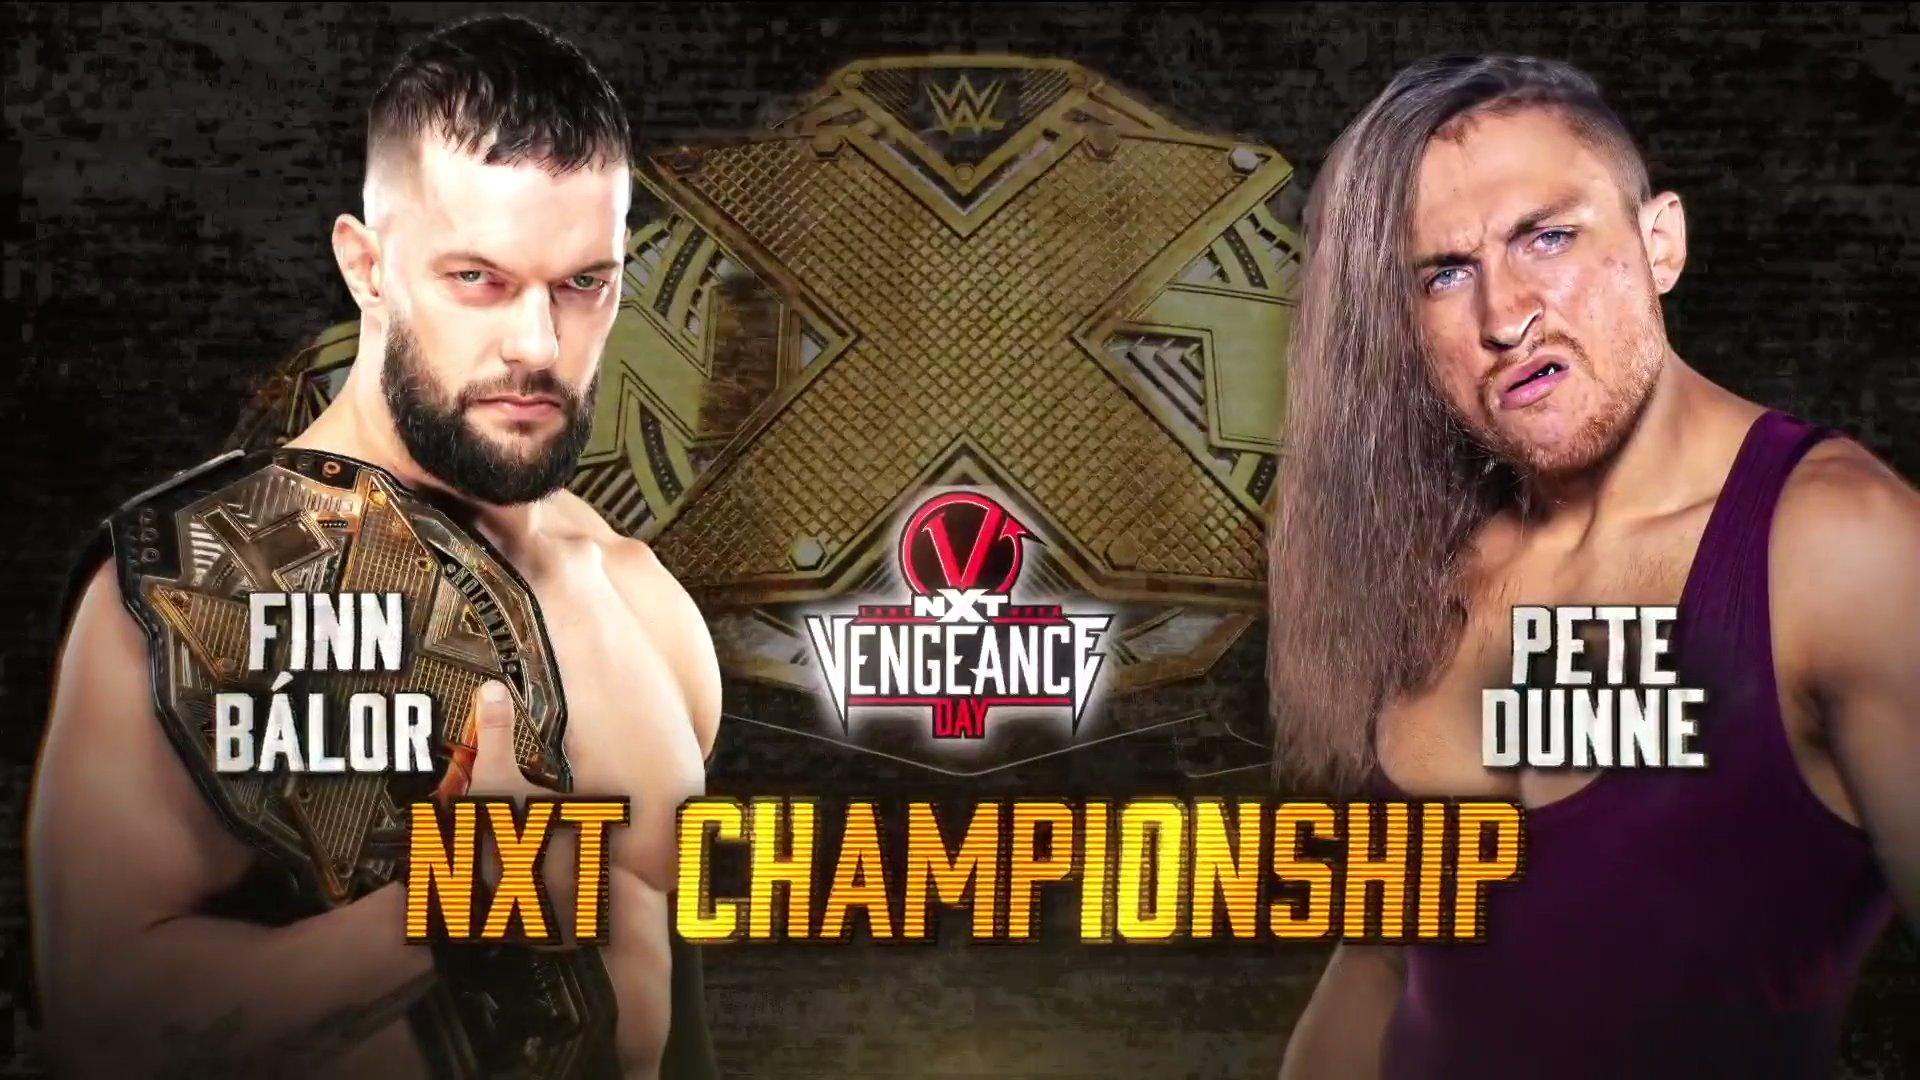 NXT Presents Vengeance Day